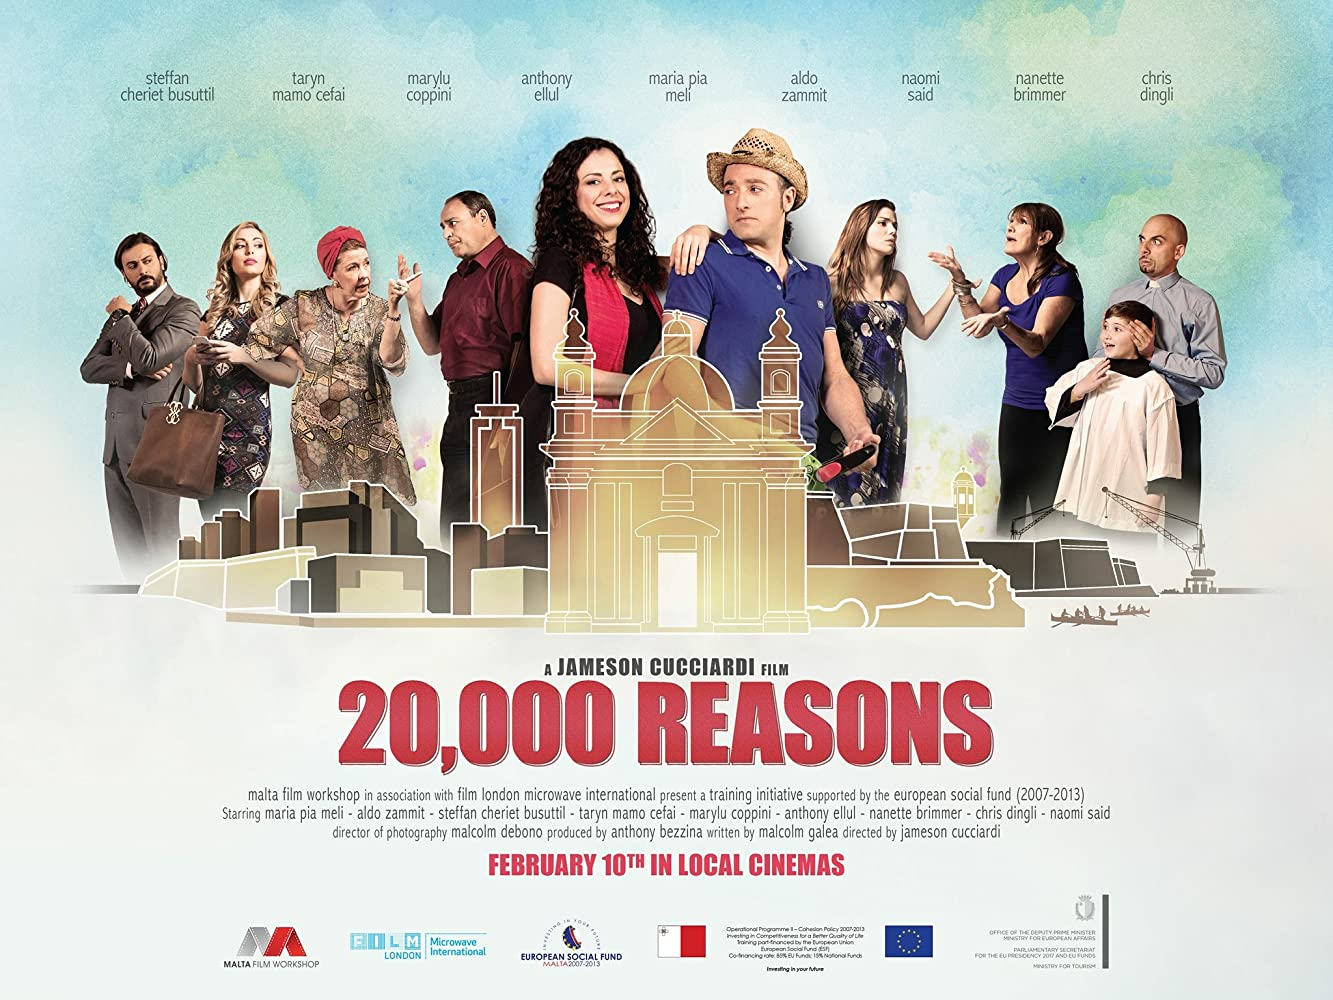 20,000 Reasons